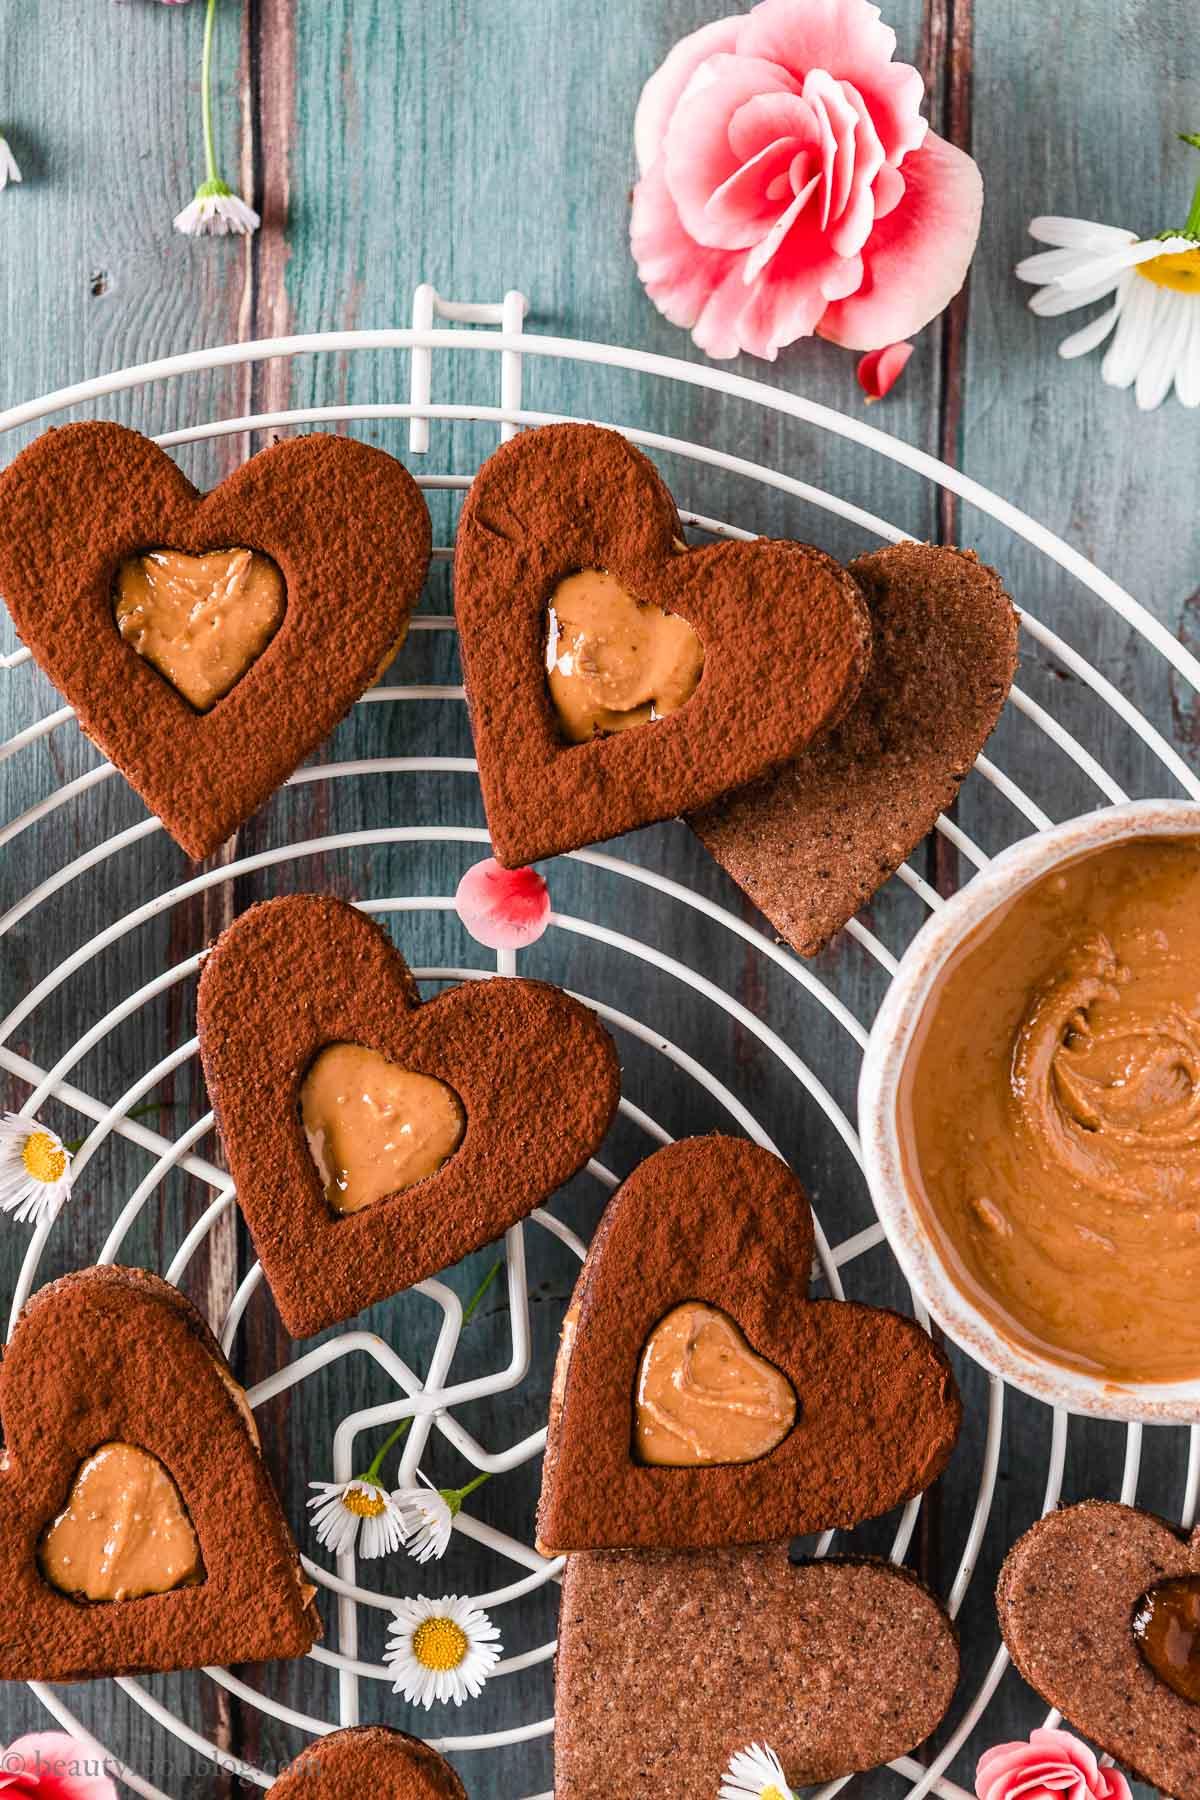 ricetta biscotti frollini vegani senza glutine al cacao gluten-free vegan chocolate almond Linzer cookies recipe